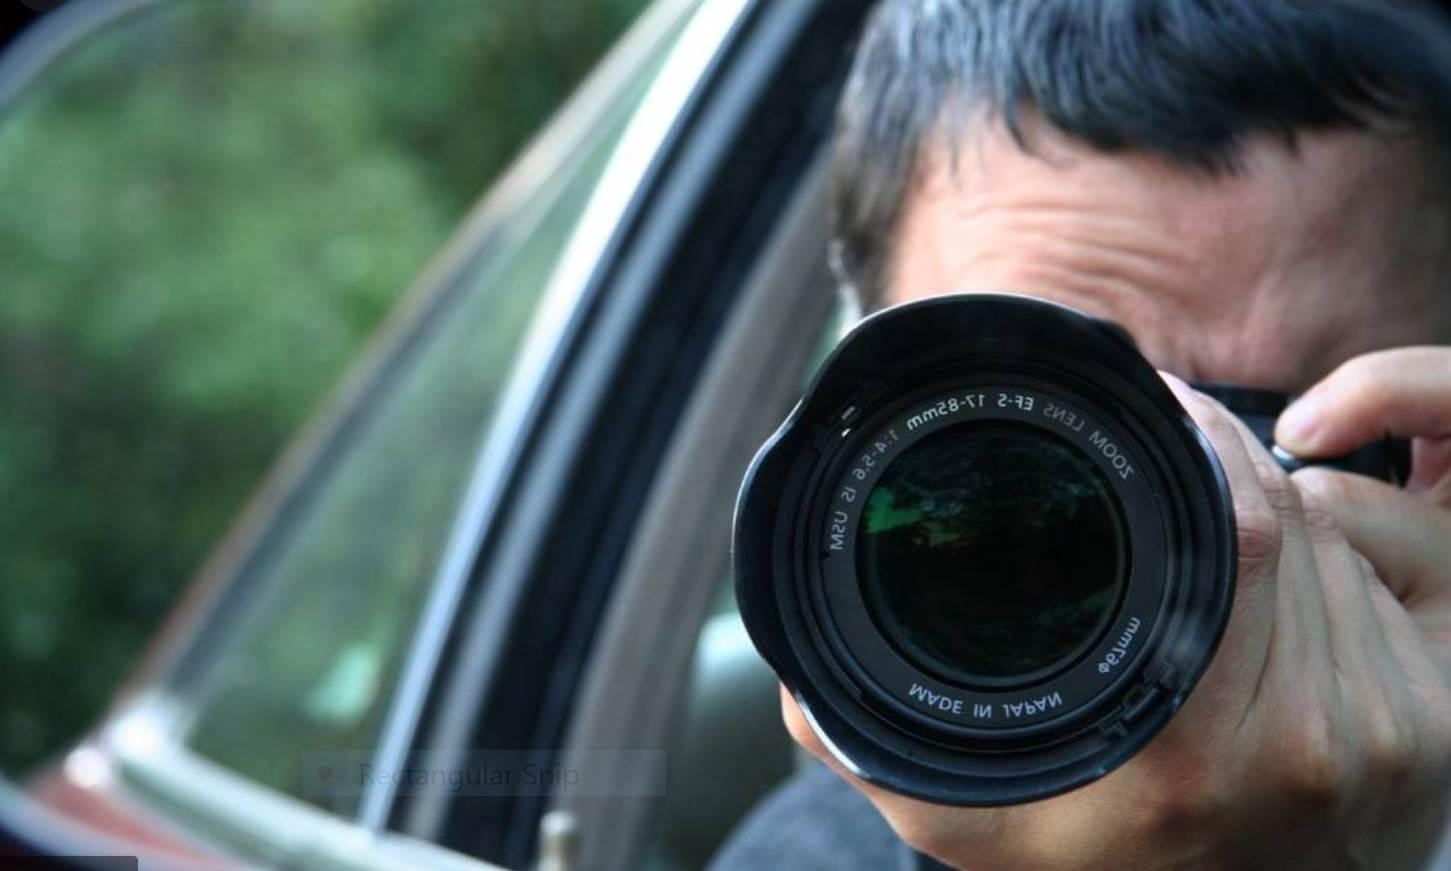 Hiring a Los Angeles Private Investigator